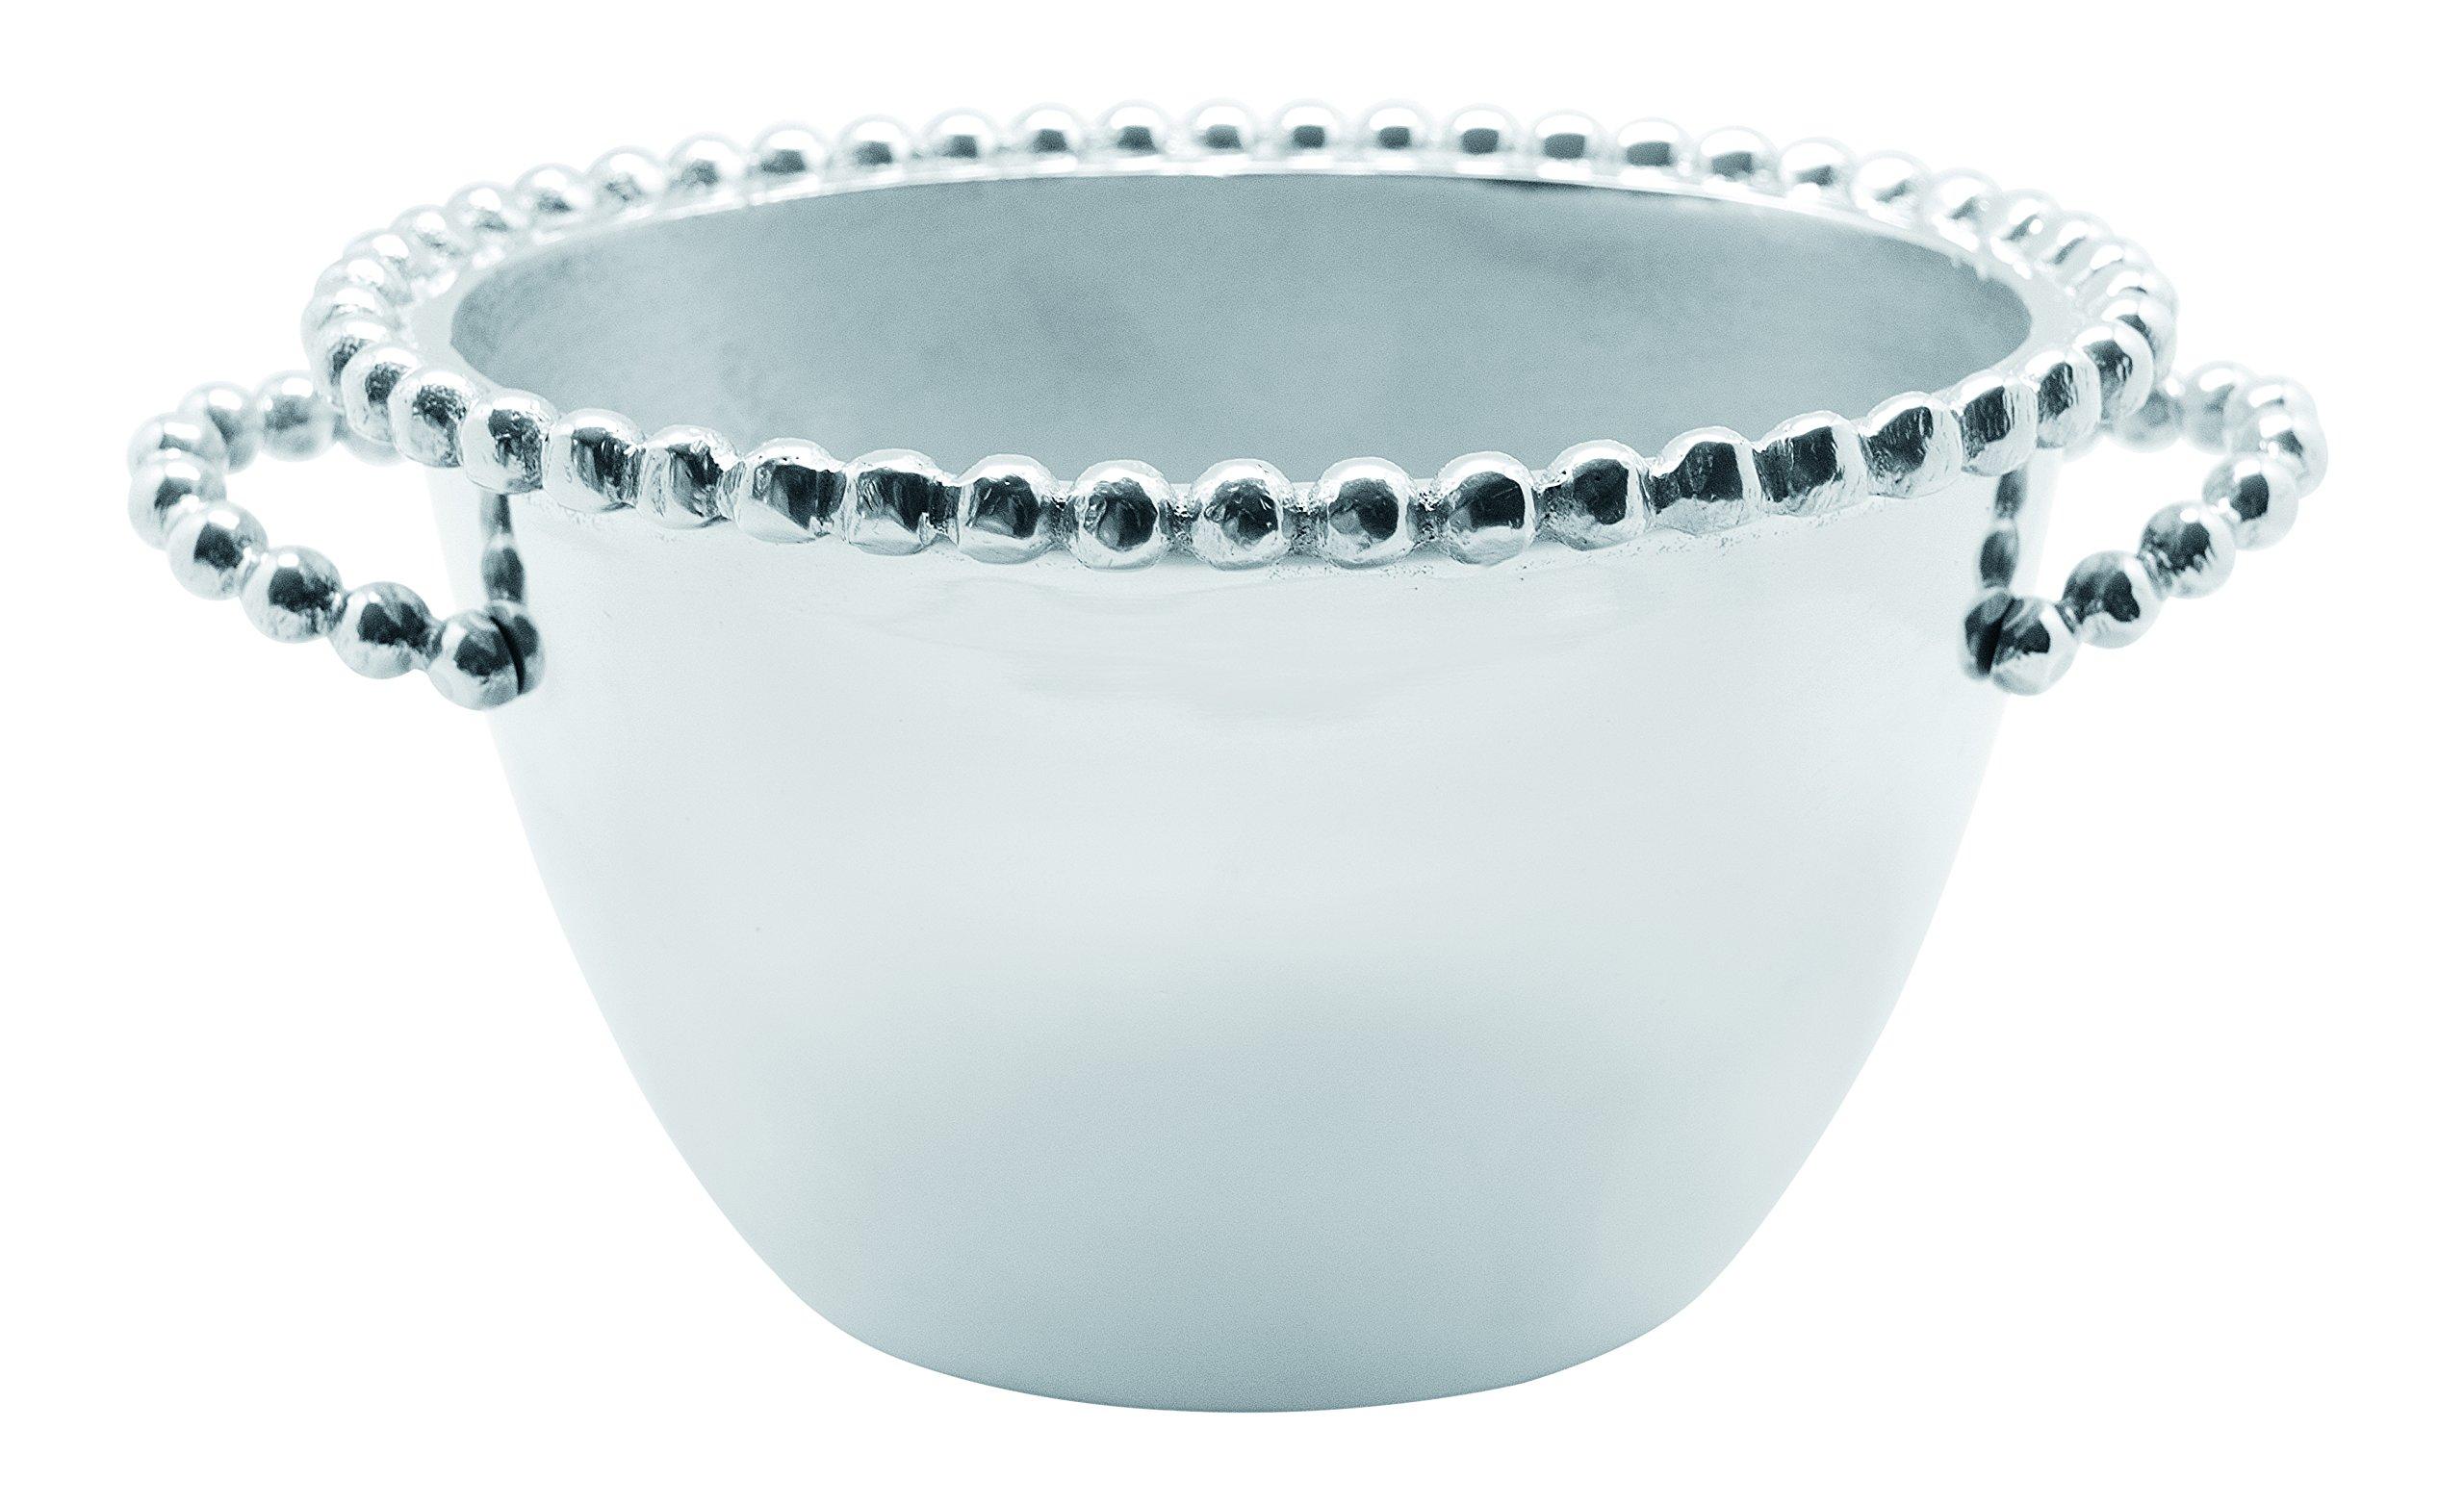 Mariposa 2732 Pearled Oval Ice Bucket, Small